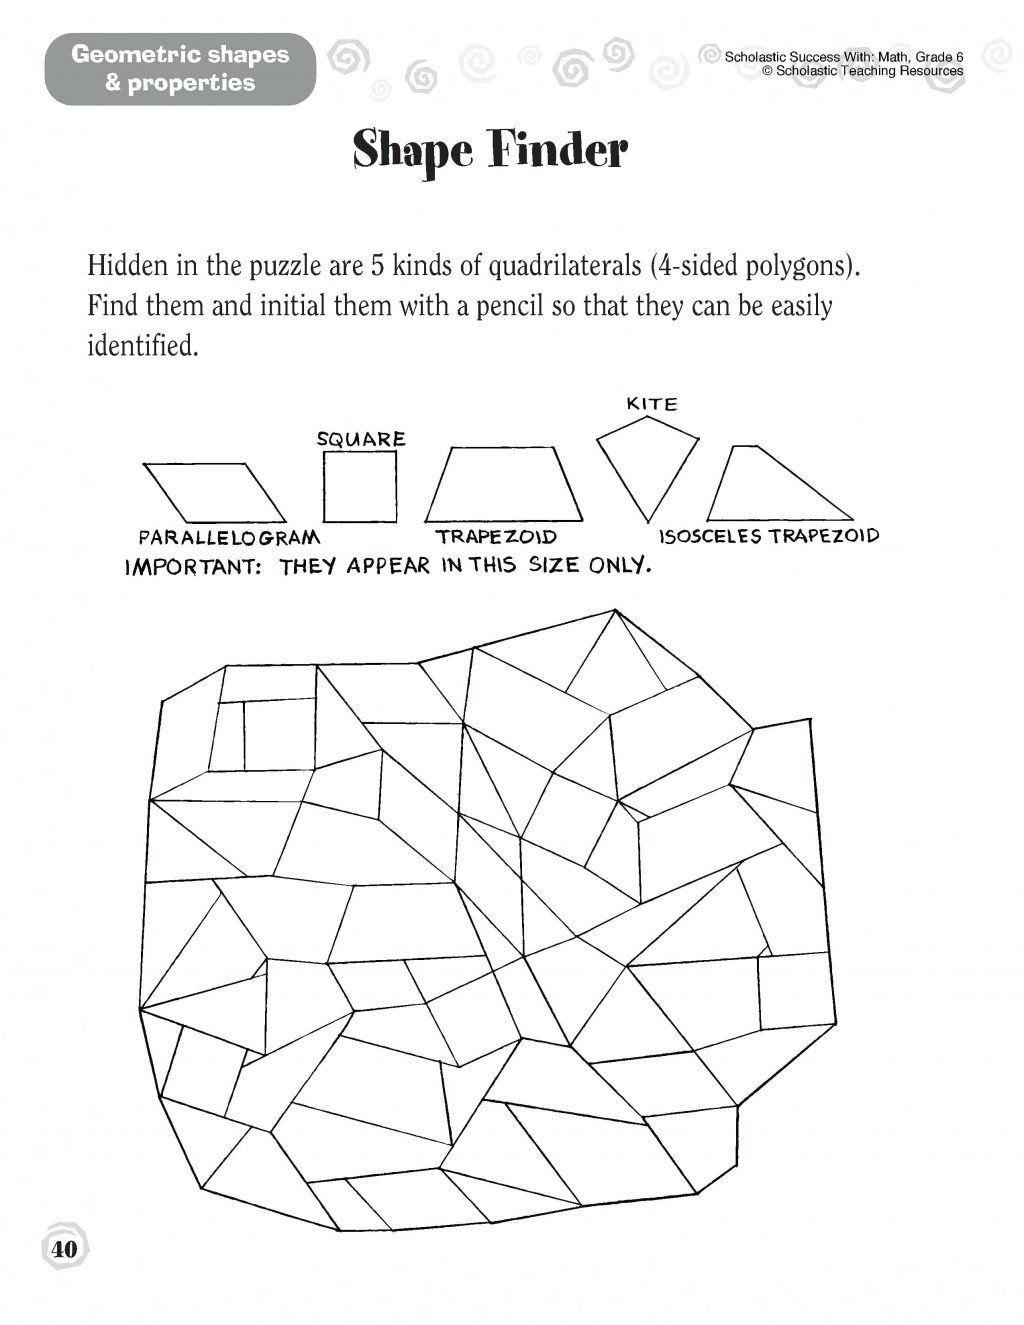 Abeka 5th Grade Math Worksheets 20 Analogy Worksheets for ...